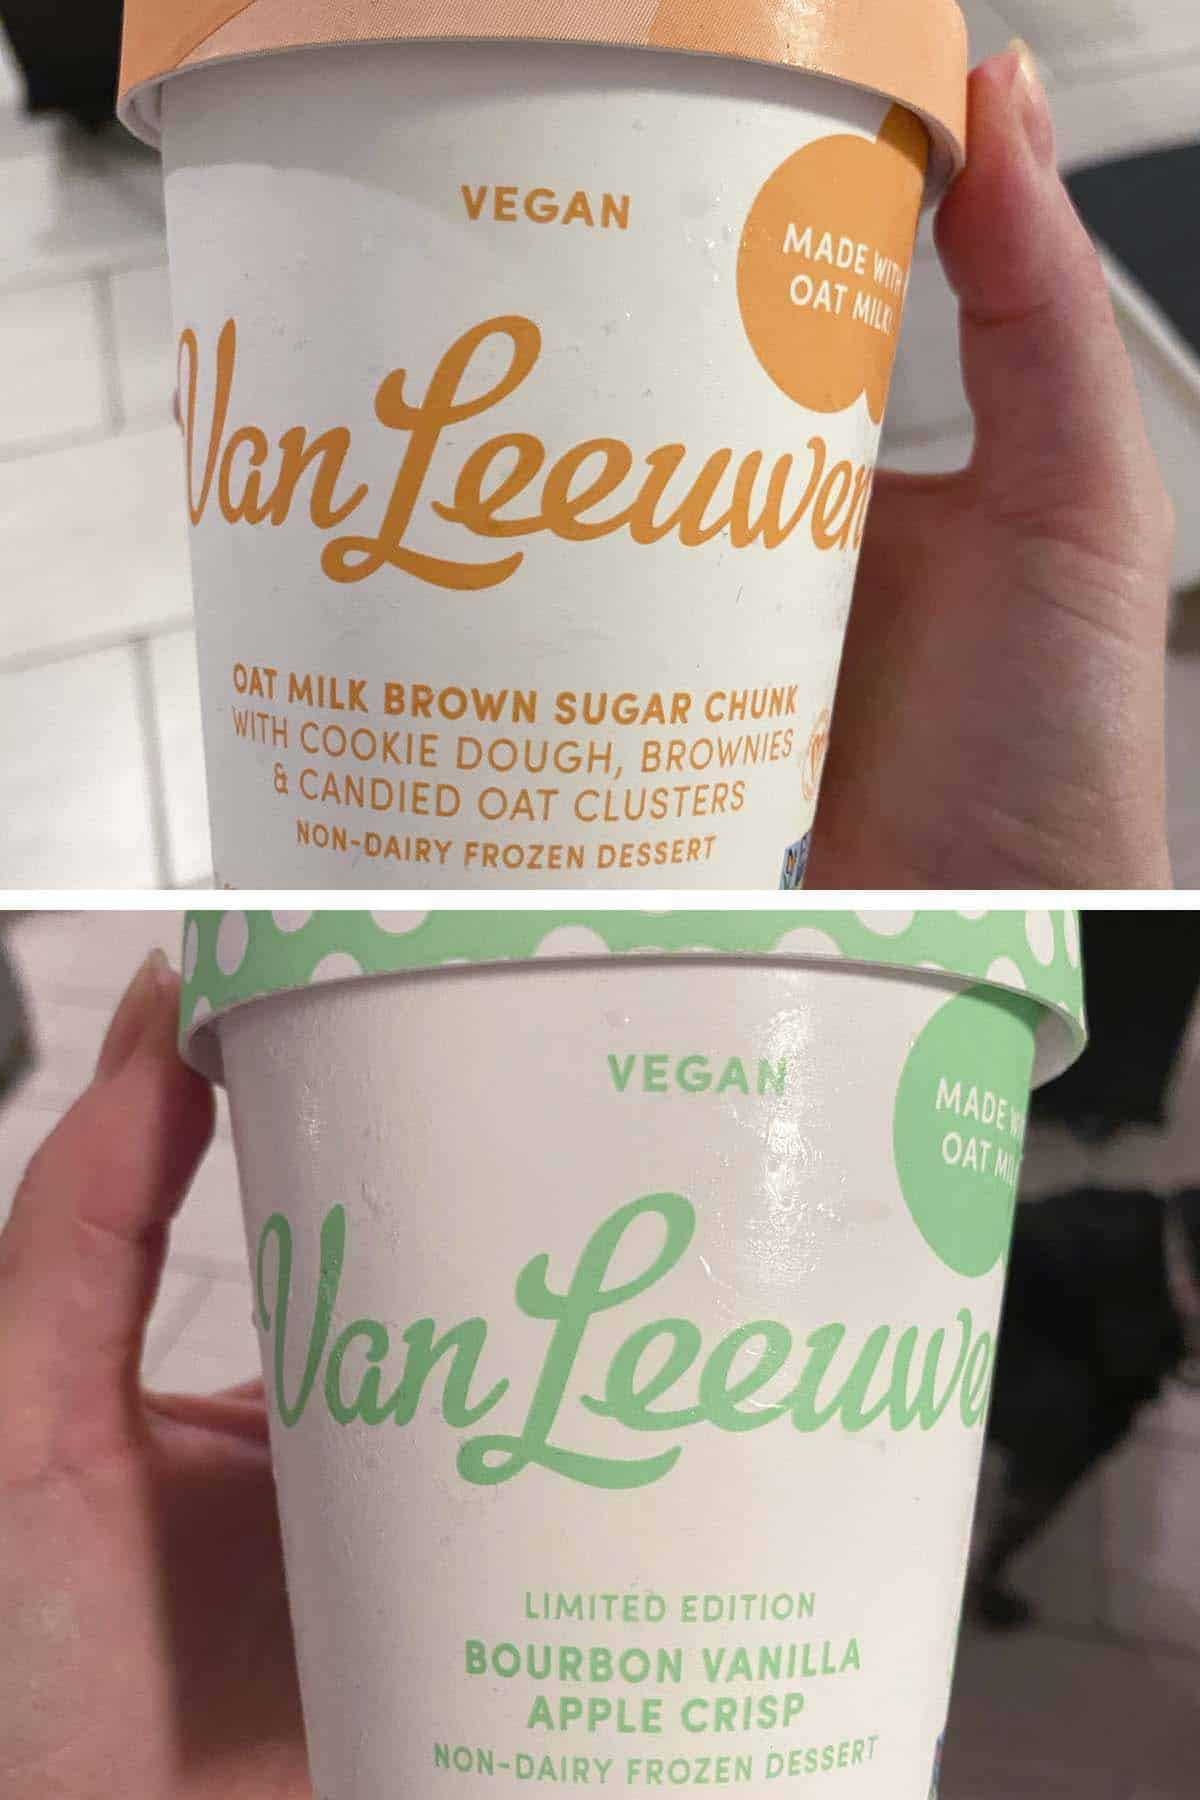 image collage of two pints of Van Leeuwen vegan ice cream: Oat Milk Brown Sugar Chunk and Bourbon Vanilla Apple Crisp